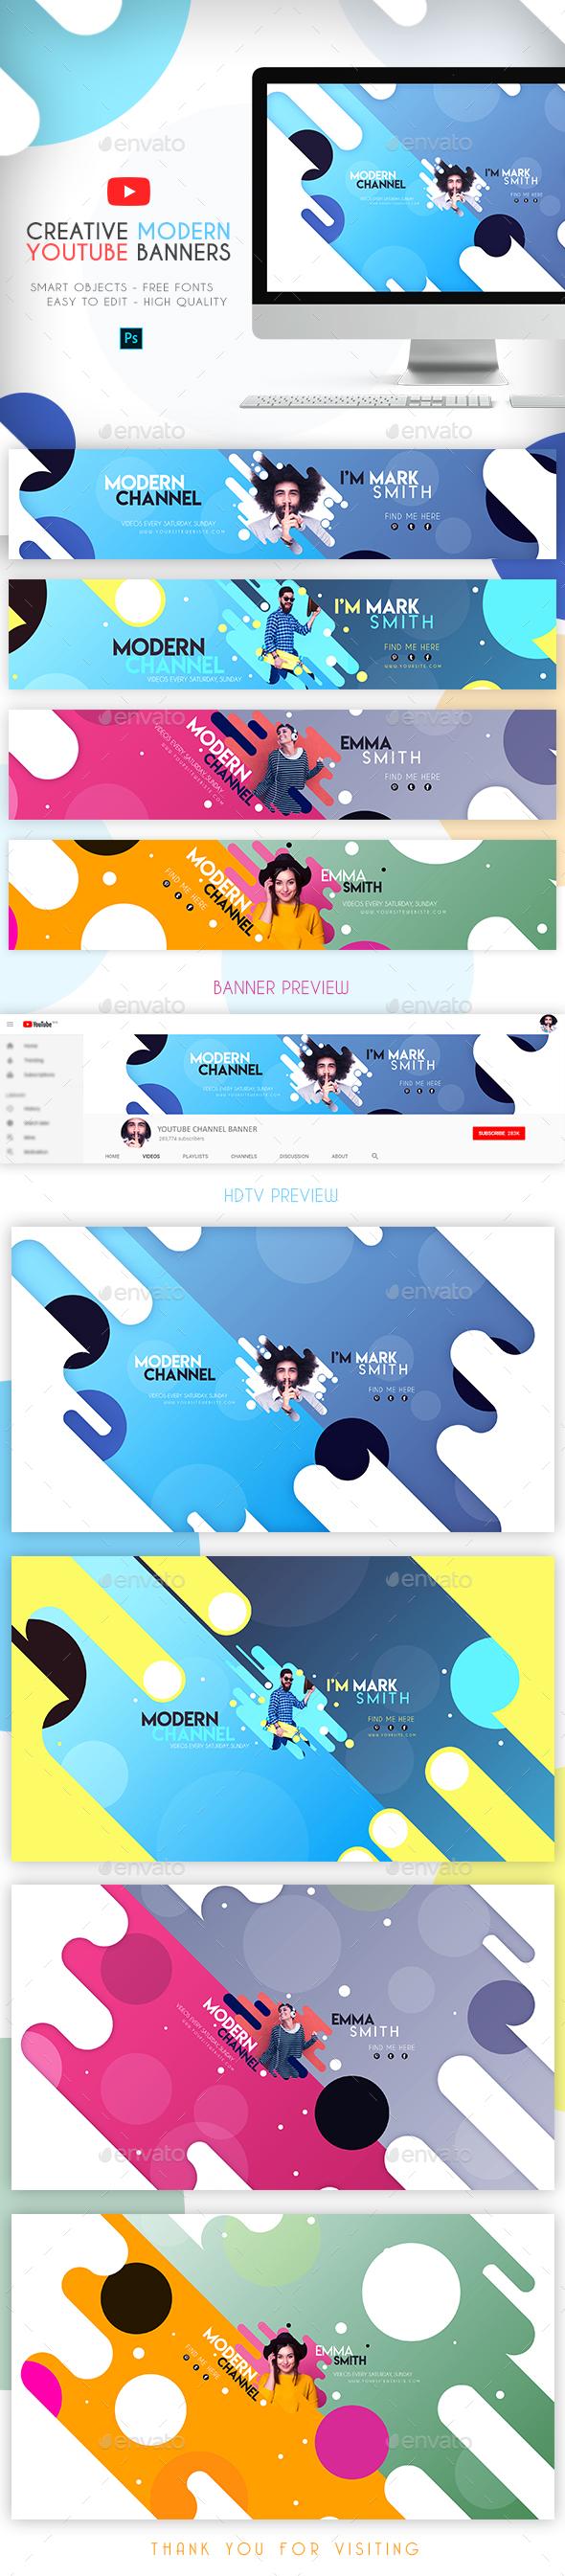 4 Creative Modern YouTube Banners - YouTube Social Media